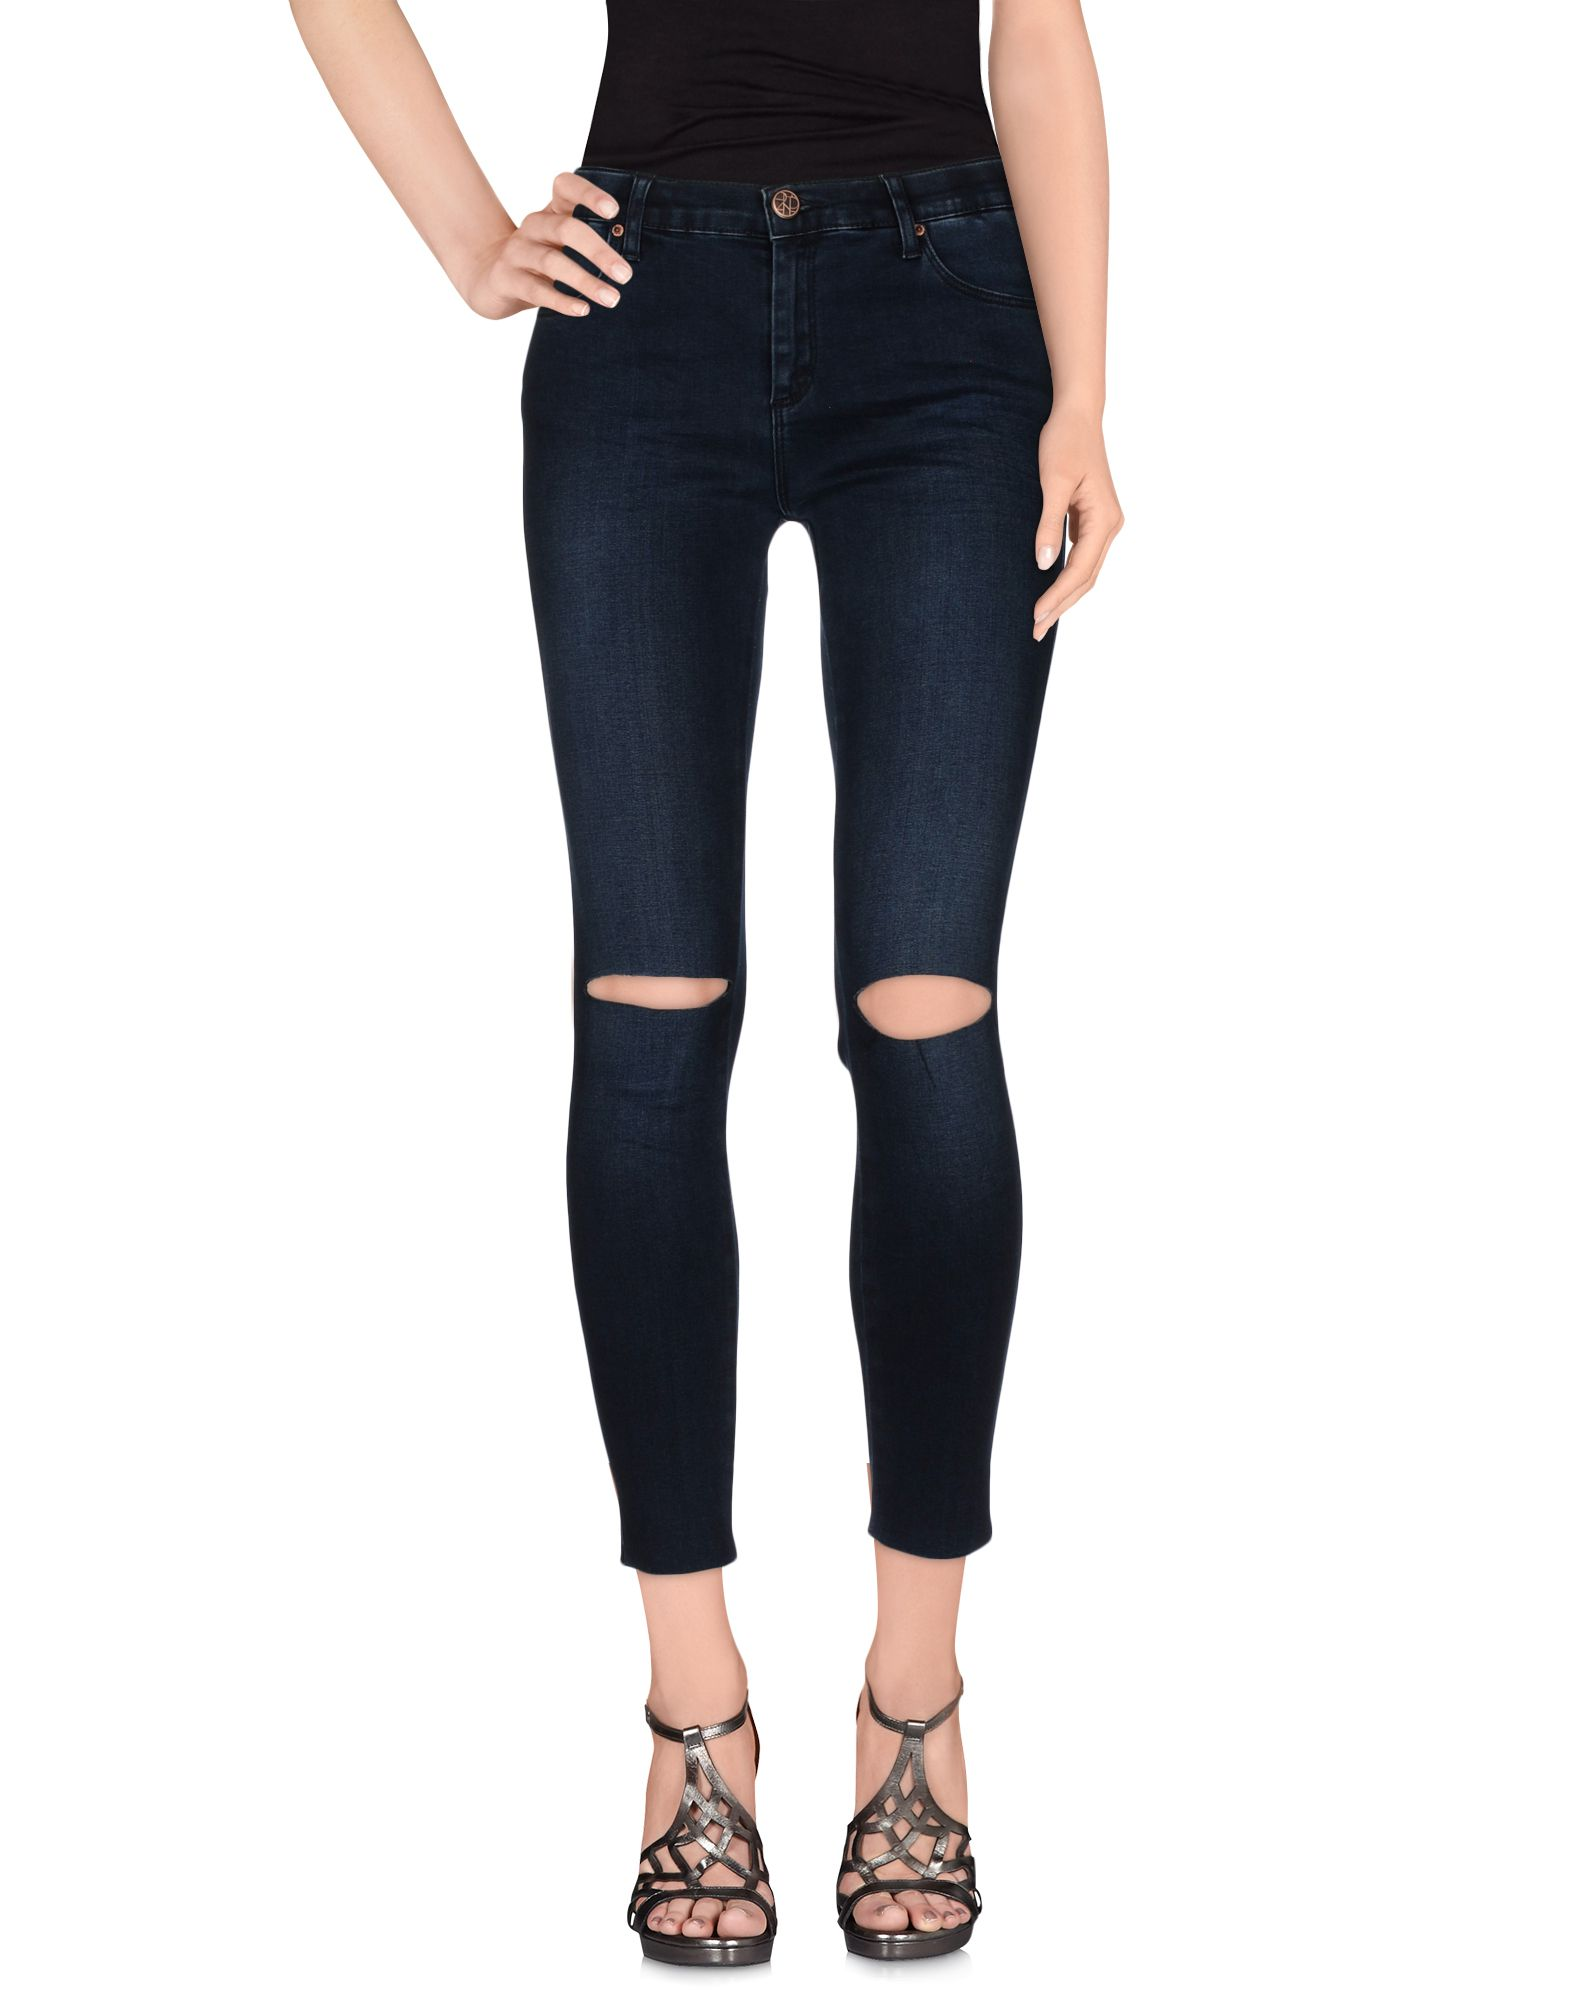 2ND ONE Damen Jeanshose Farbe Blau Größe 6